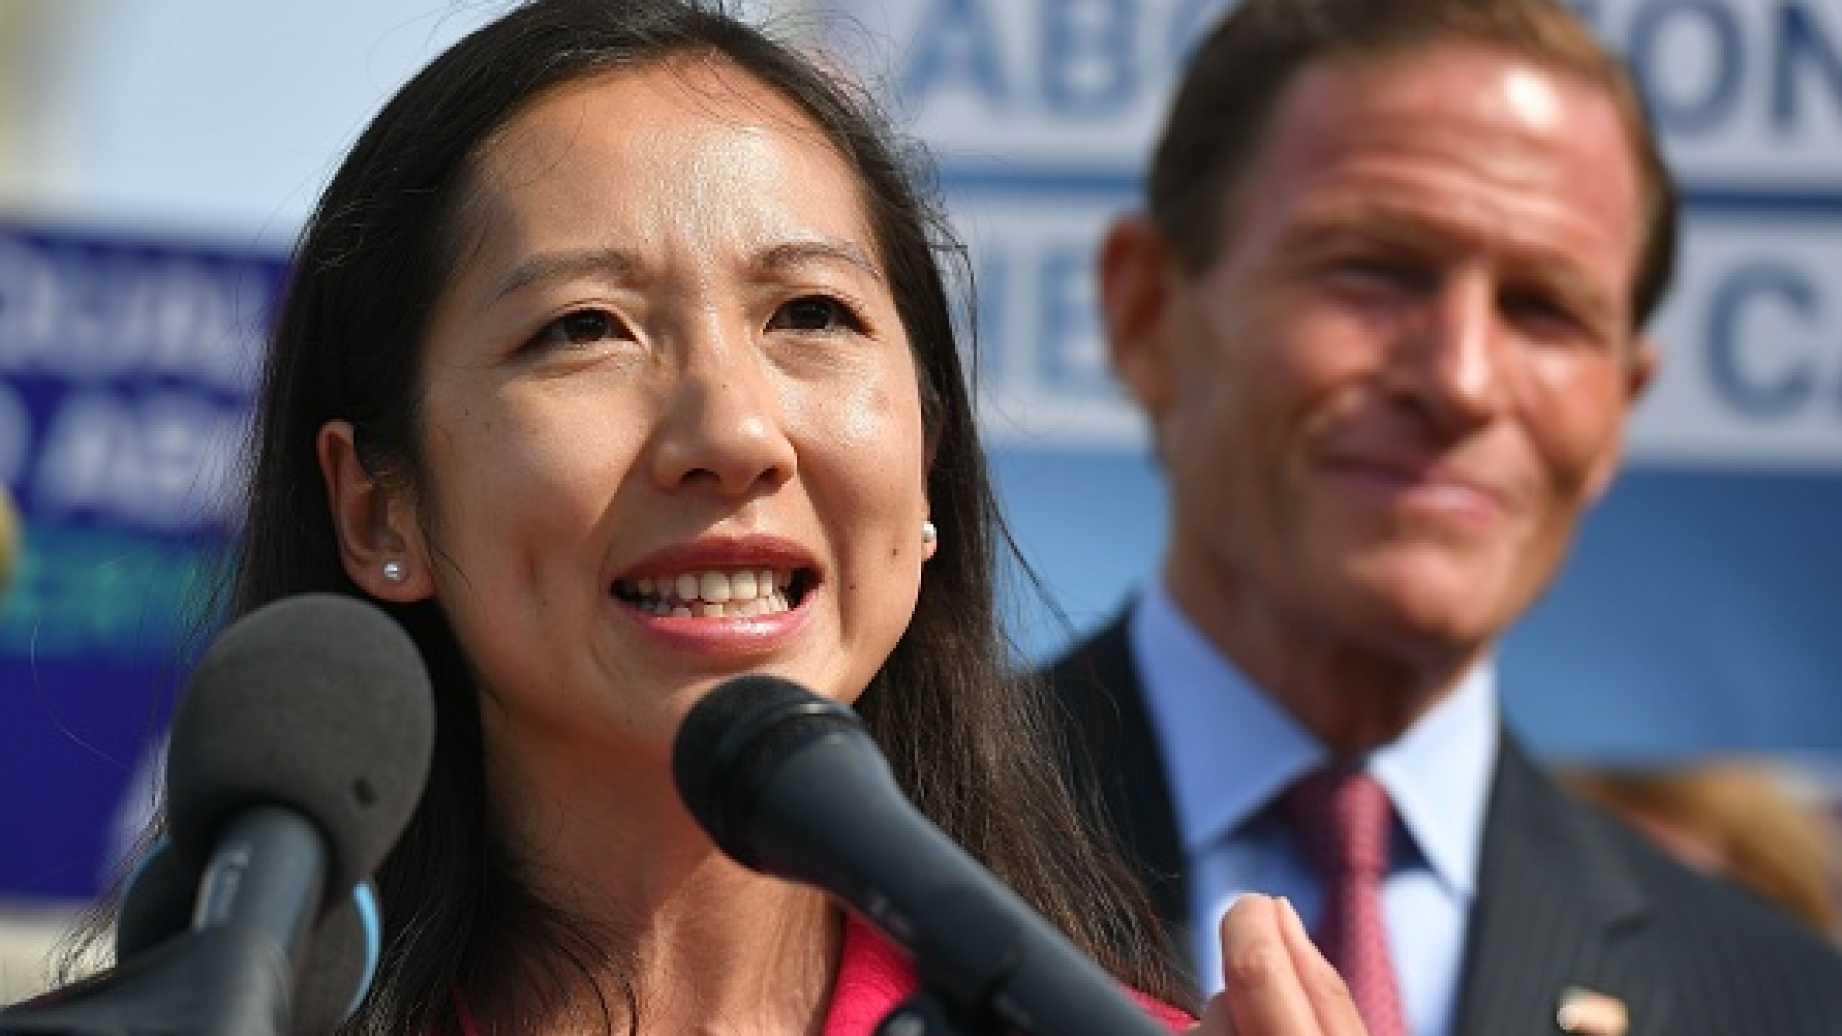 Planned Parenthood President Leana Wen